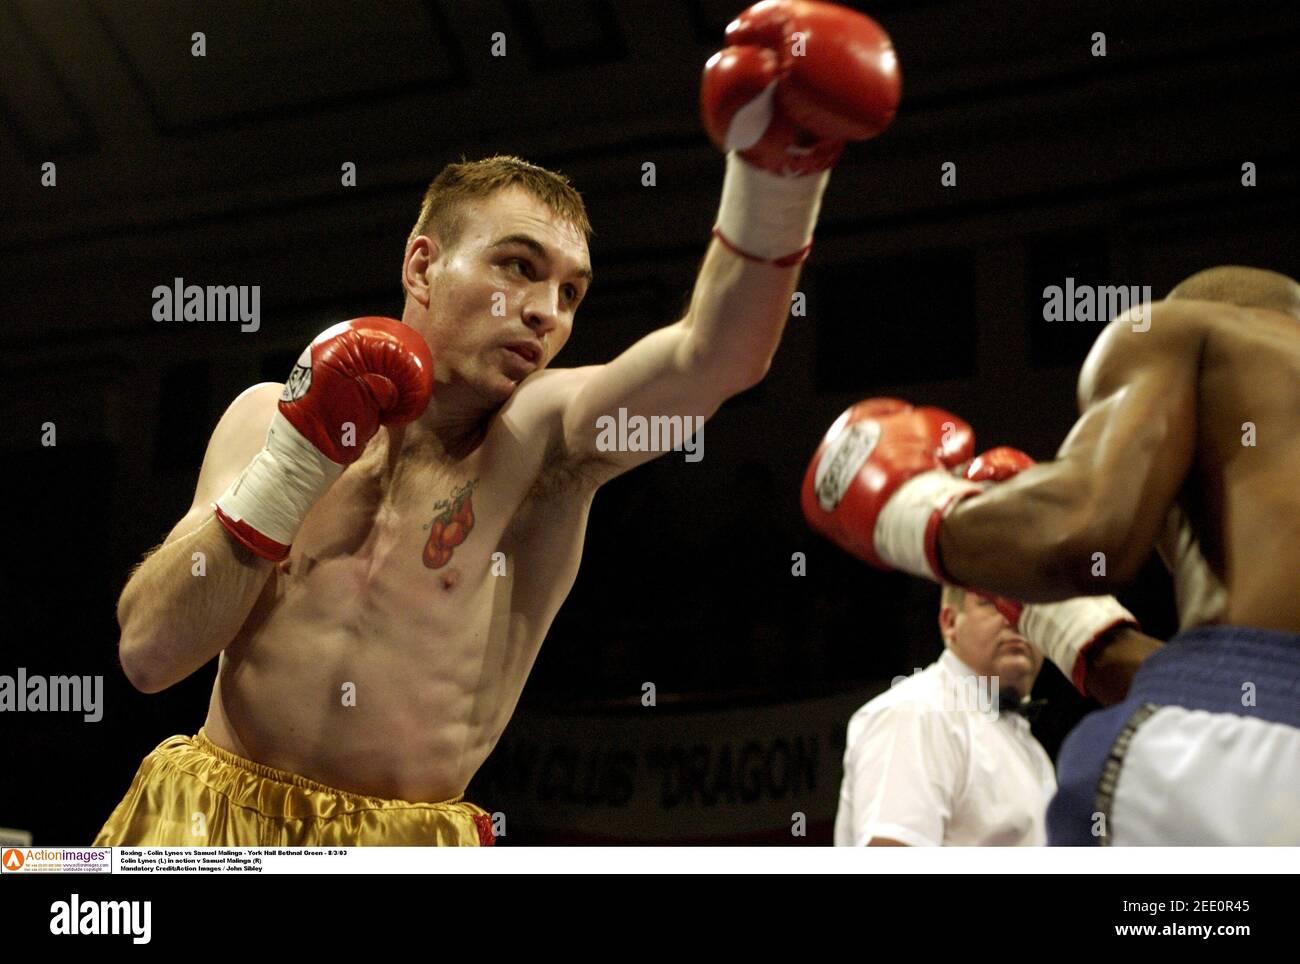 Boxe - Colin Lynes contre Samuel Malinga - York Hall Bethnal Green - 8/3/03 Colin Lynes (L) en action v Samuel Malinga (R) crédit obligatoire:Images d'action / John Sibley Banque D'Images